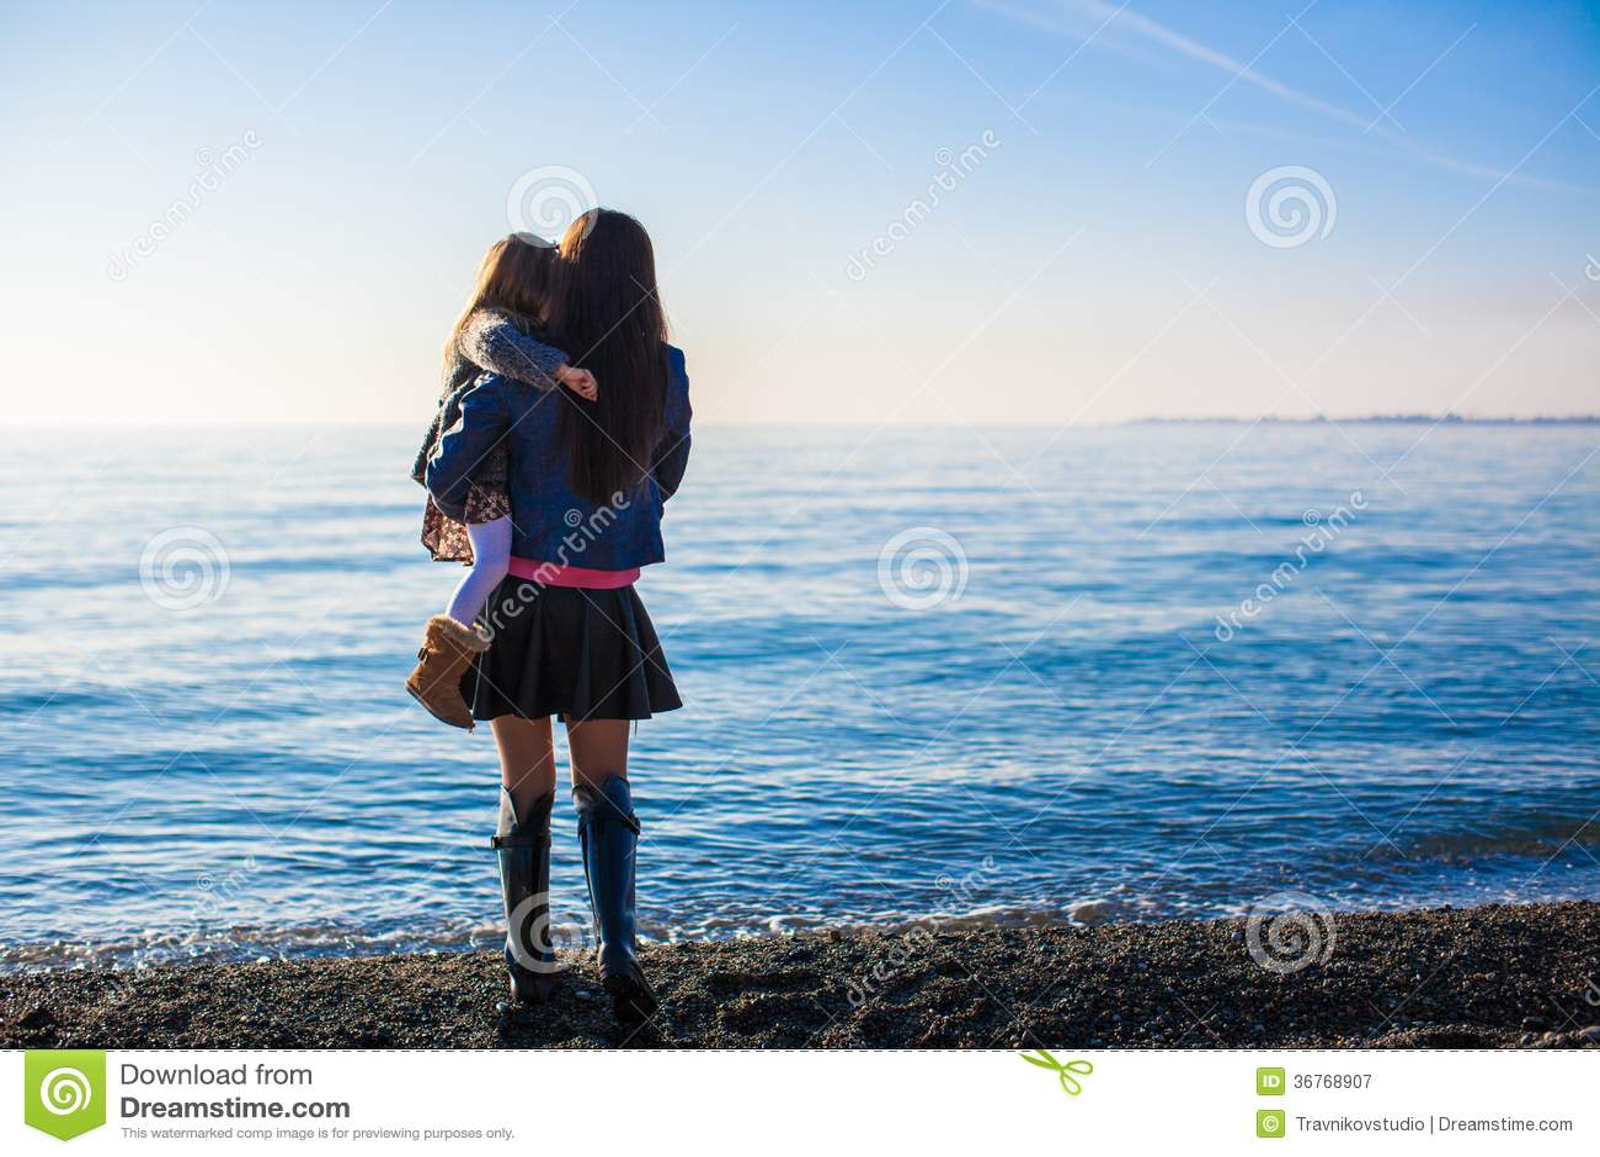 winter beach girls Voyeur, voyeur web, project voyeur, private voyeur, free voyeur, amateur voyeur, true voyeur, voyeur cam, beach voyeur, teen voyeur, voyeur upskirt, voyeur video.